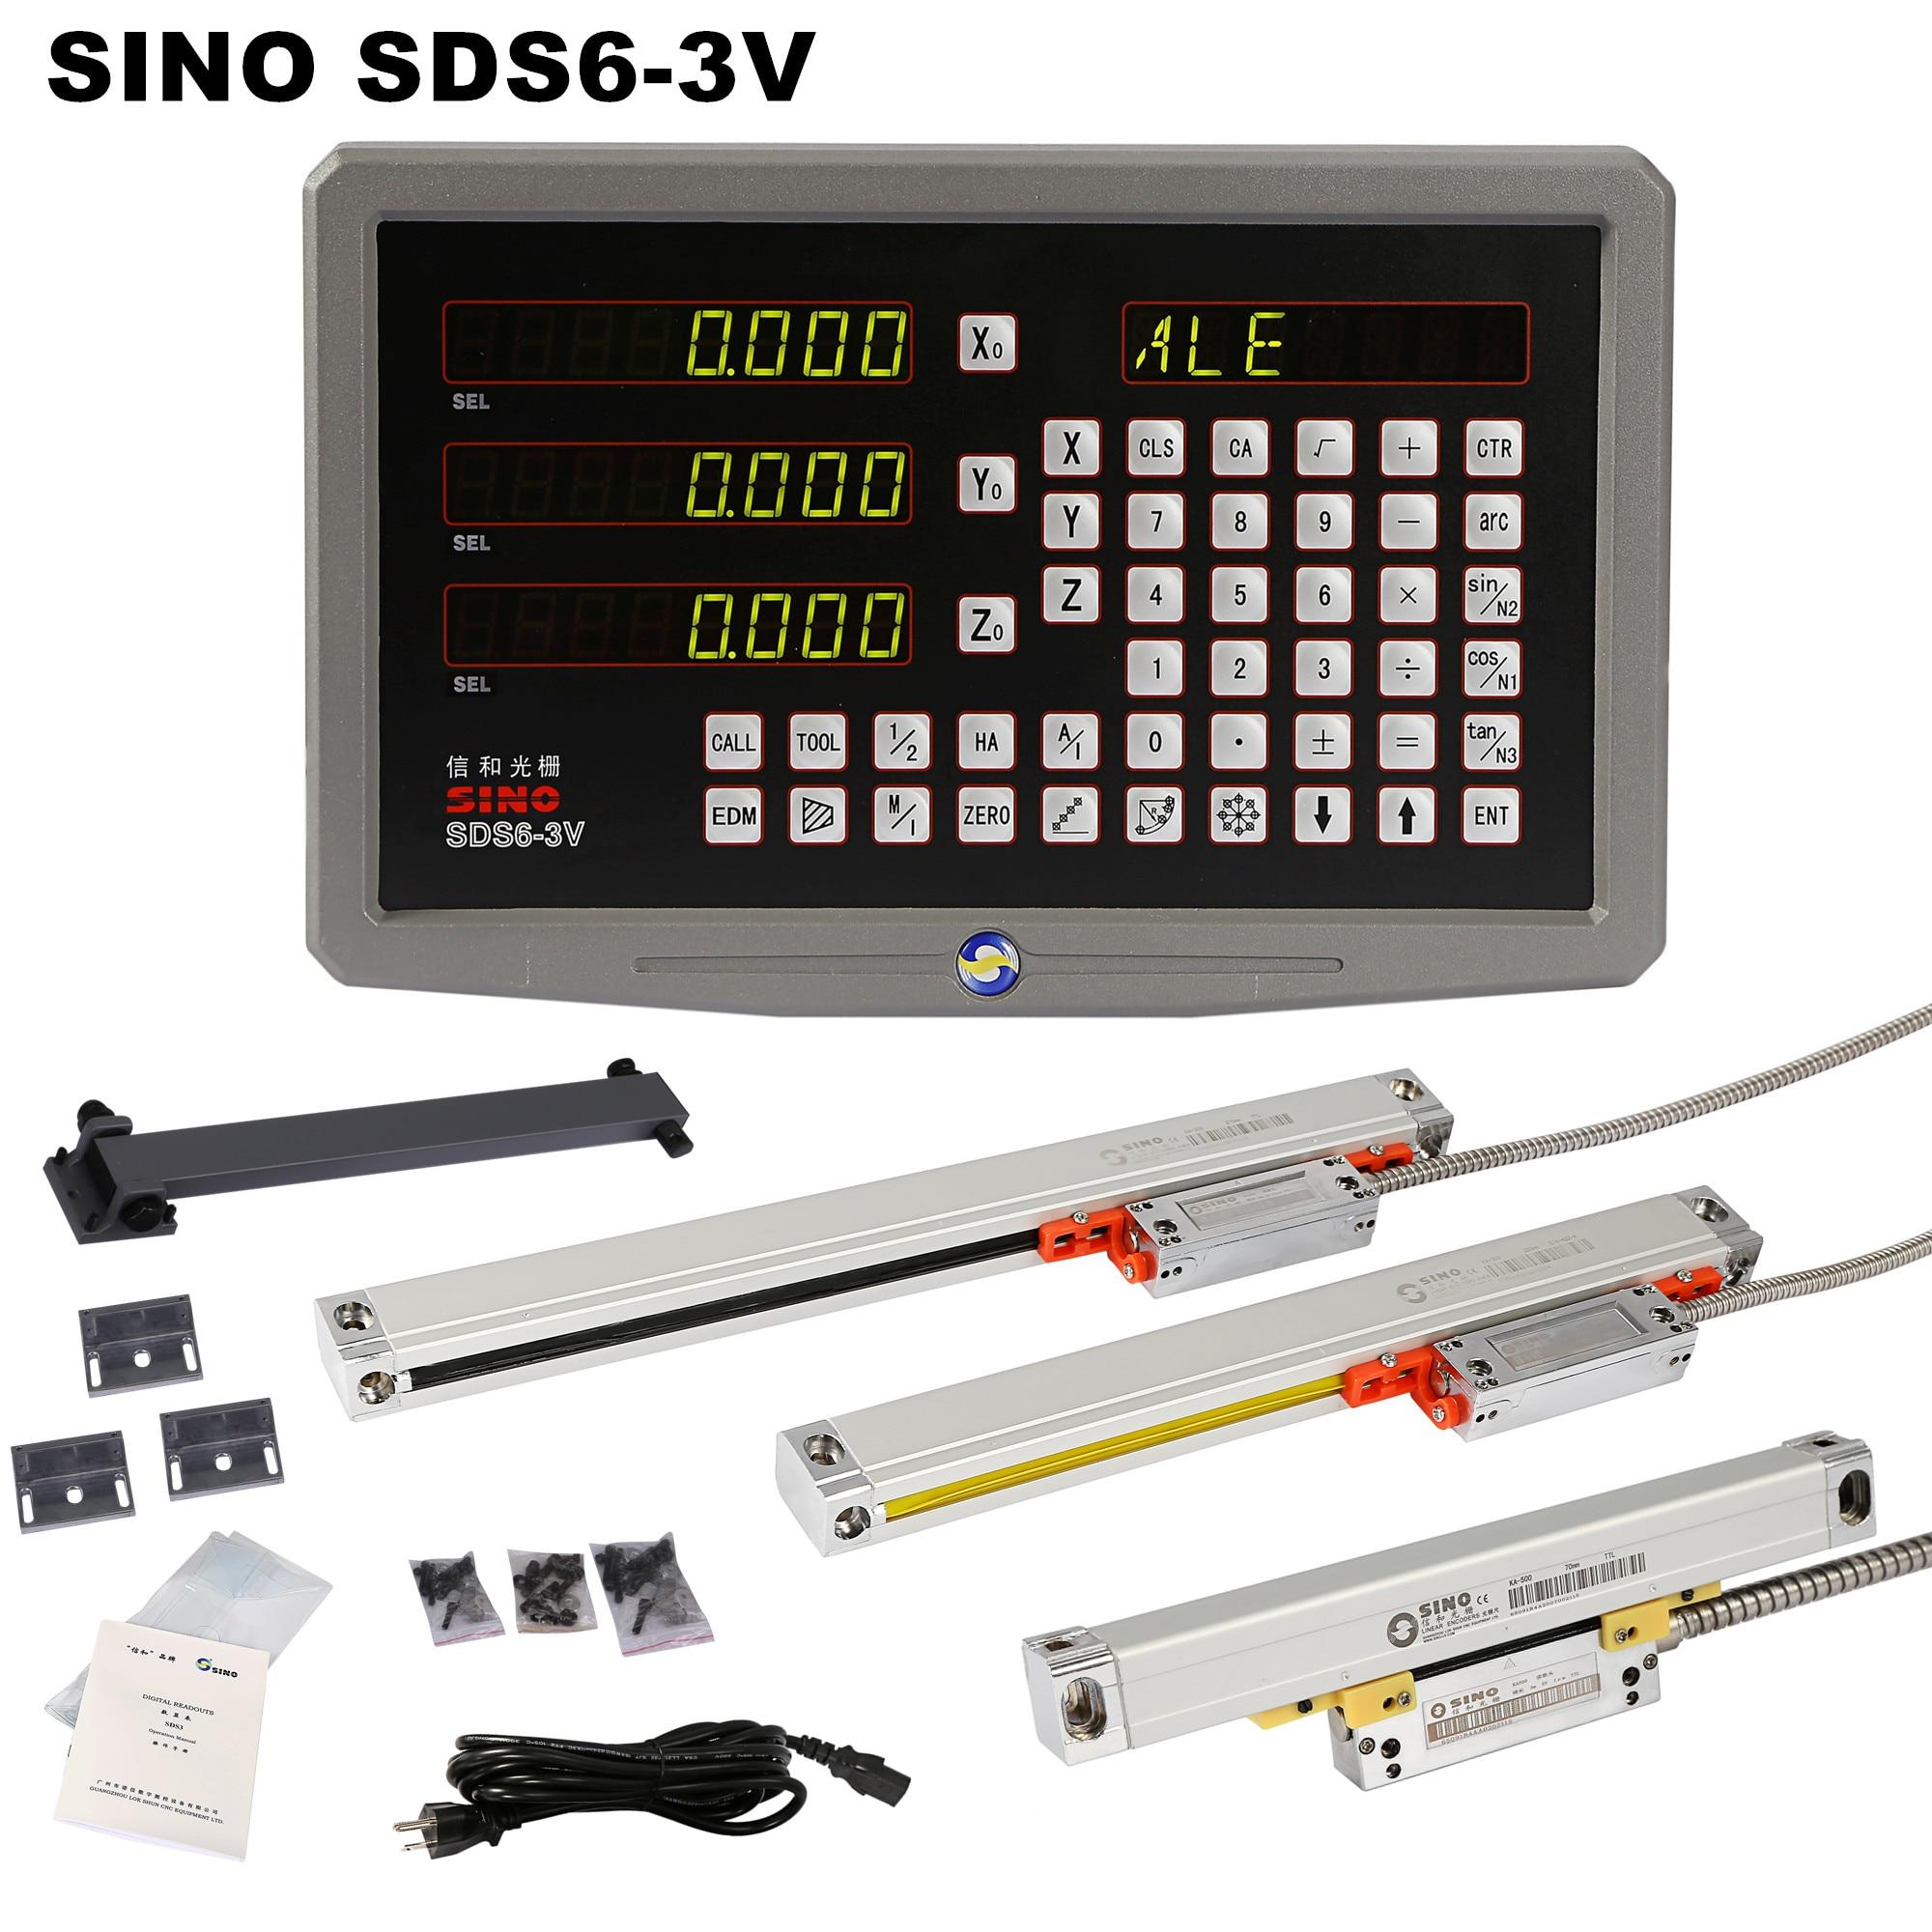 SINO SDS6-3V المعادن 3 محور مخرطة طحن DRO قراءات رقمية و 5um KA-300 مقياس خطي + KA-500 سليم البصرية التشفير حاكم